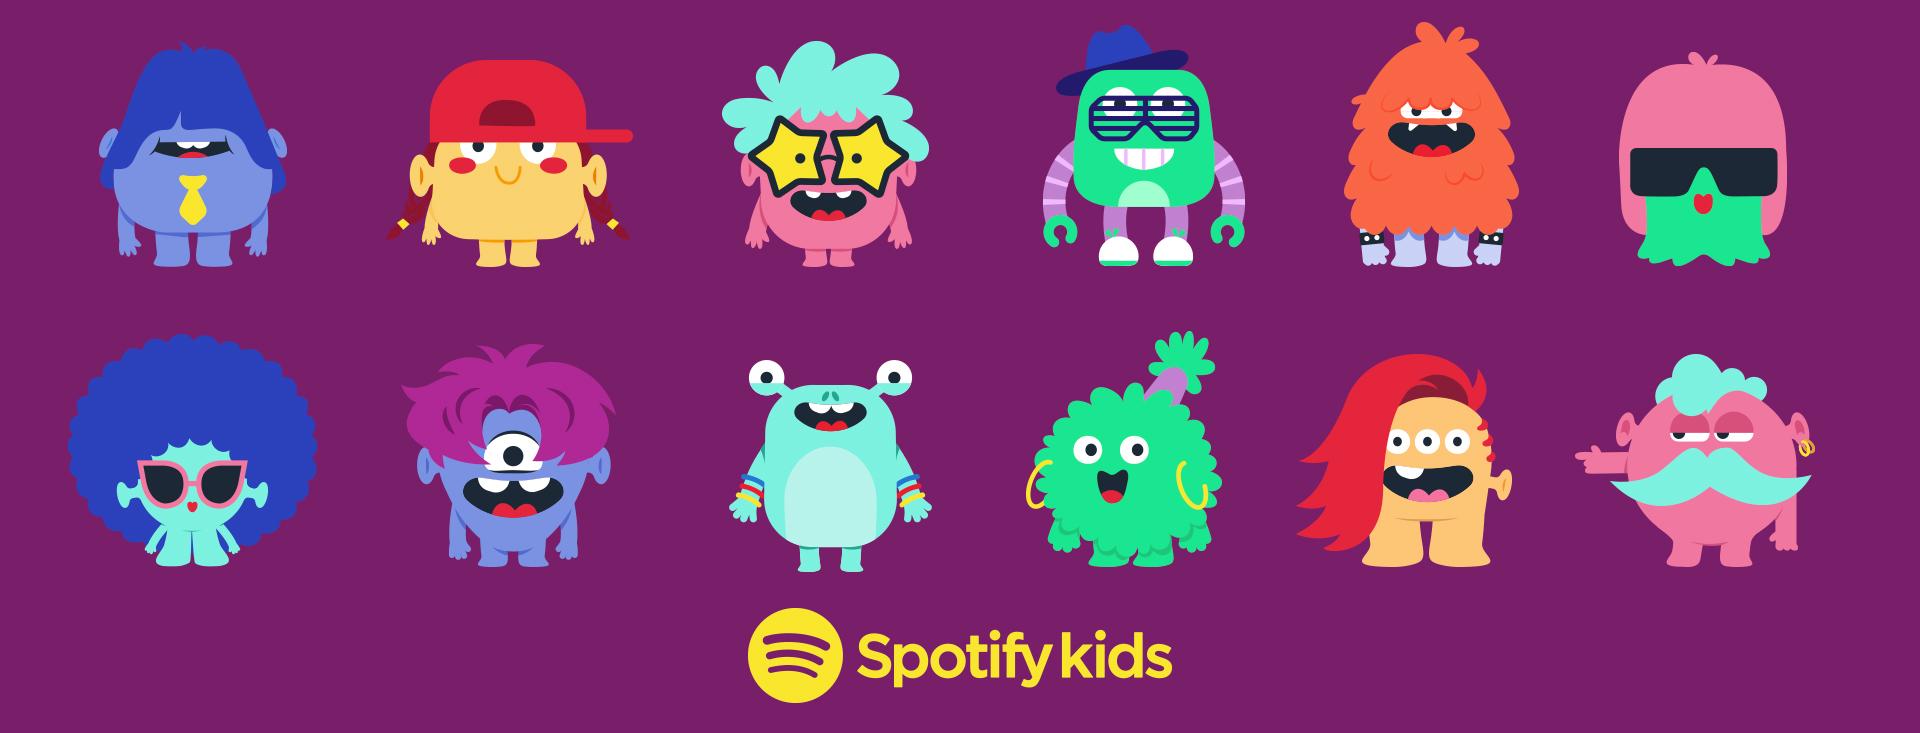 spotify for kids